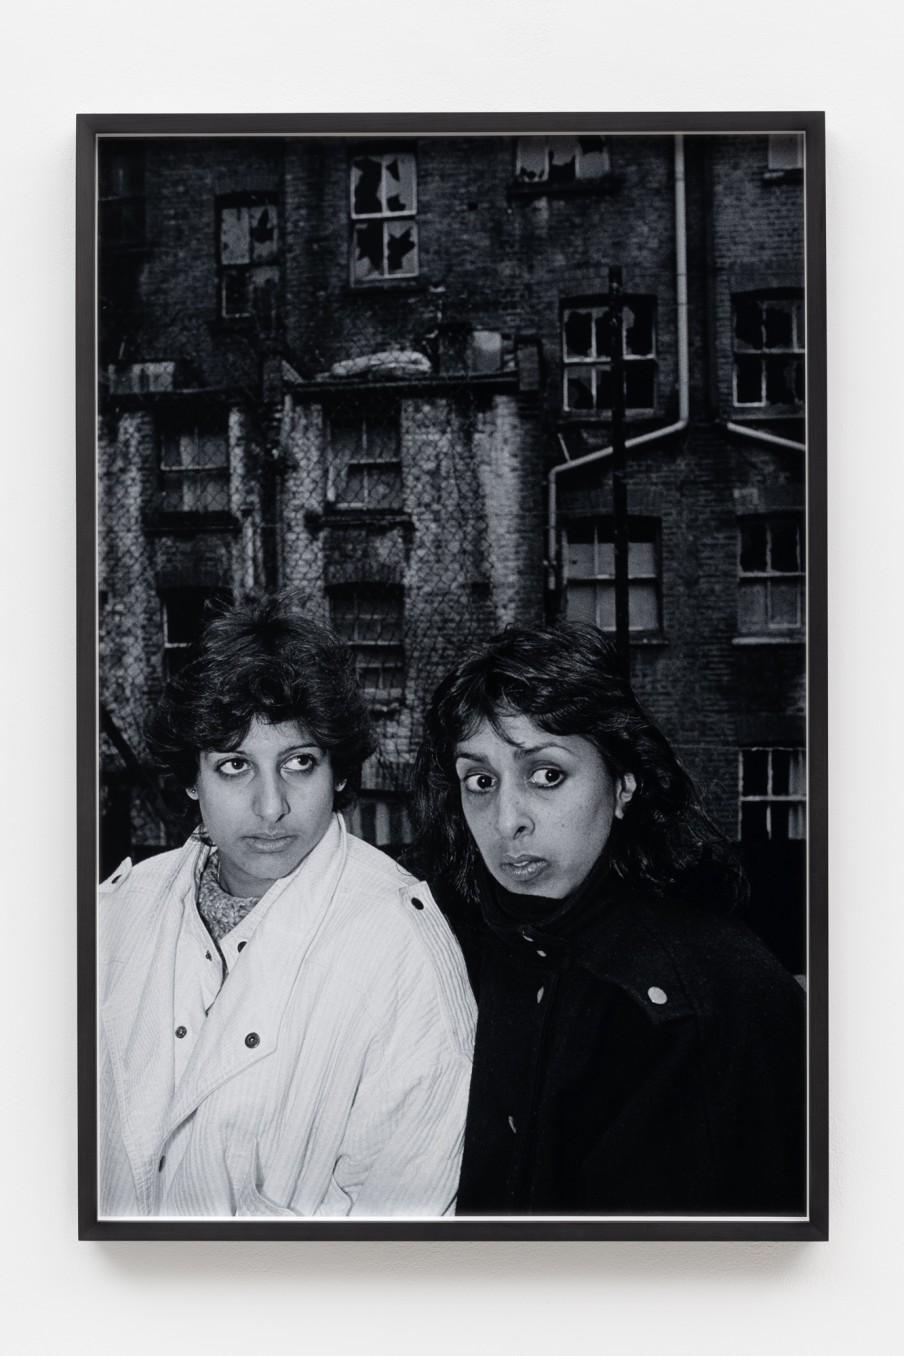 Sunil Gupta Fear, 1986/2021 Archival inkjet print Print: 90.9 x 59.5 cm 35 3/4 x 23 3/8 in